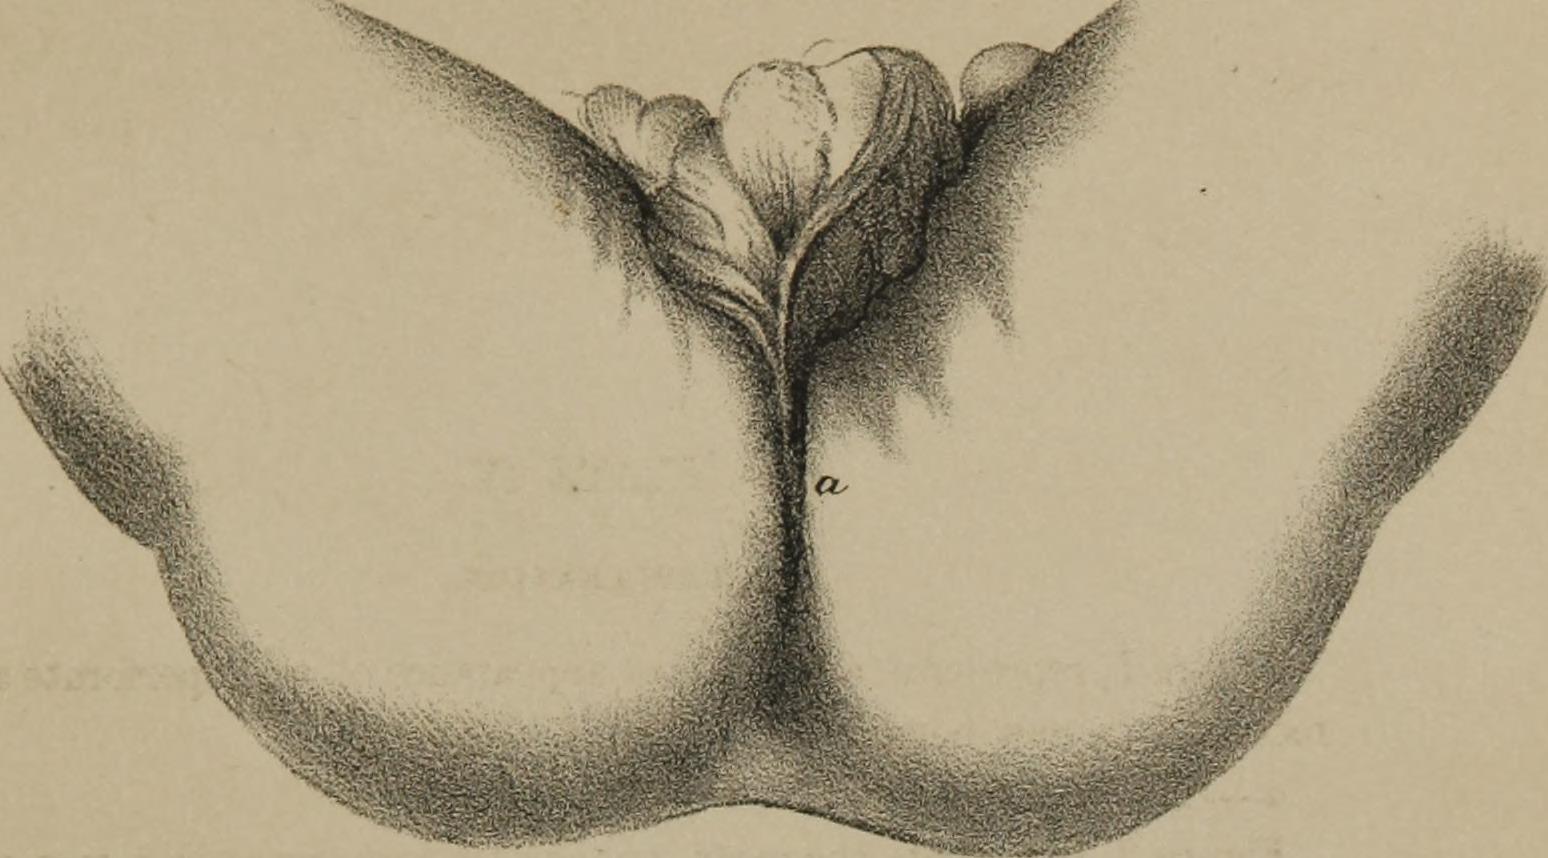 Petting crotch anus rectum, woman having a fuck